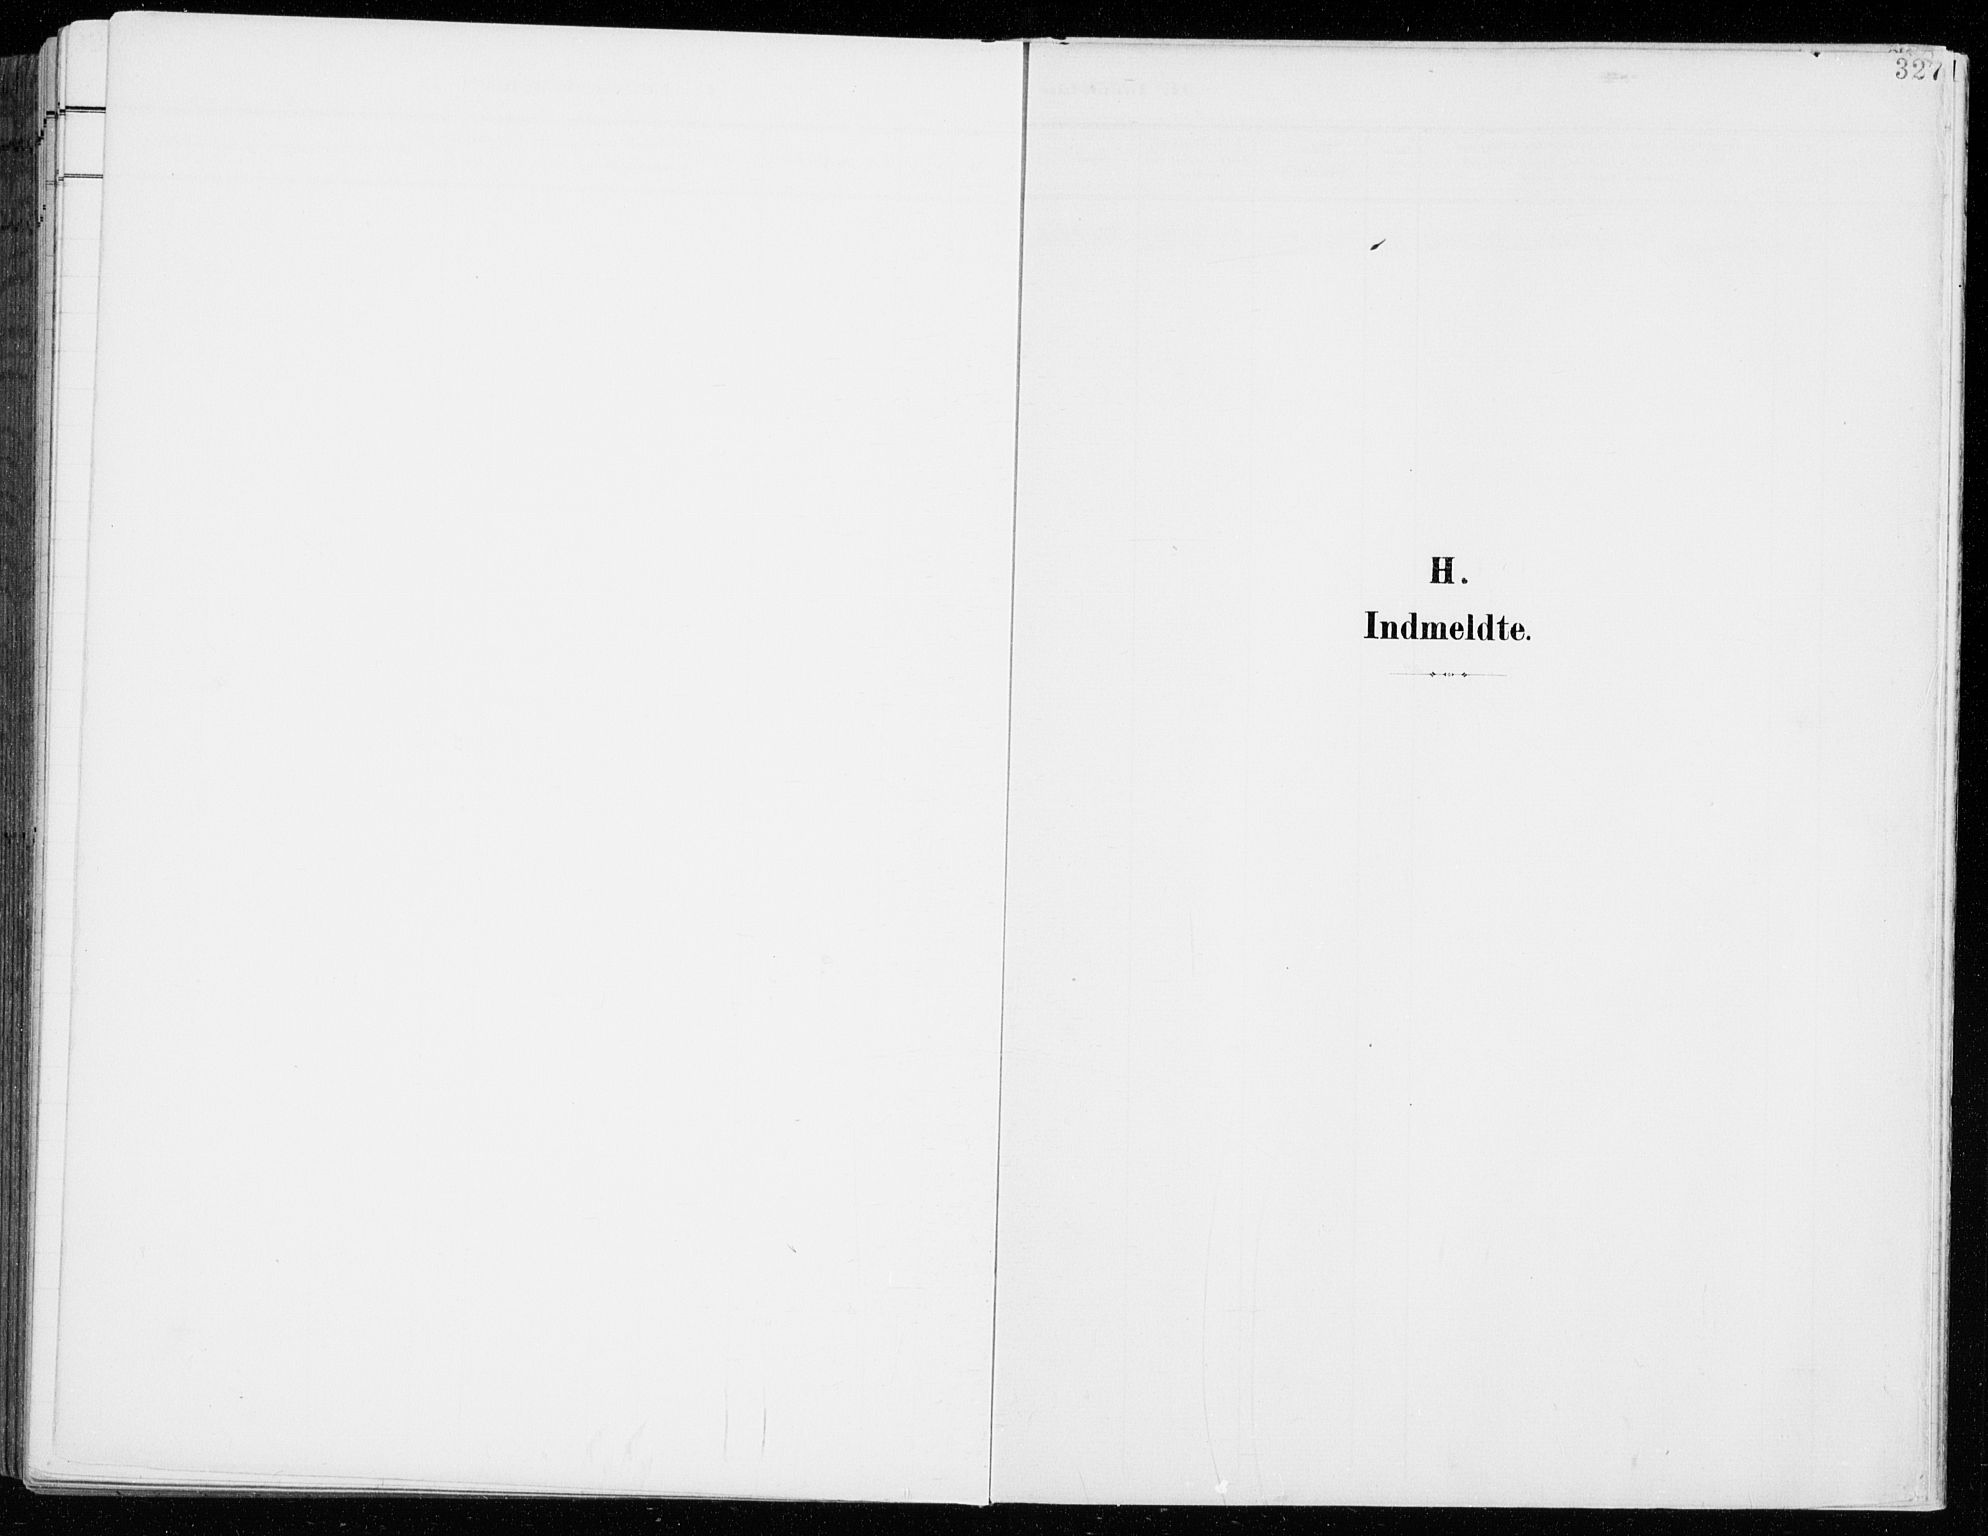 SAH, Fåberg prestekontor, Ministerialbok nr. 11, 1899-1913, s. 327